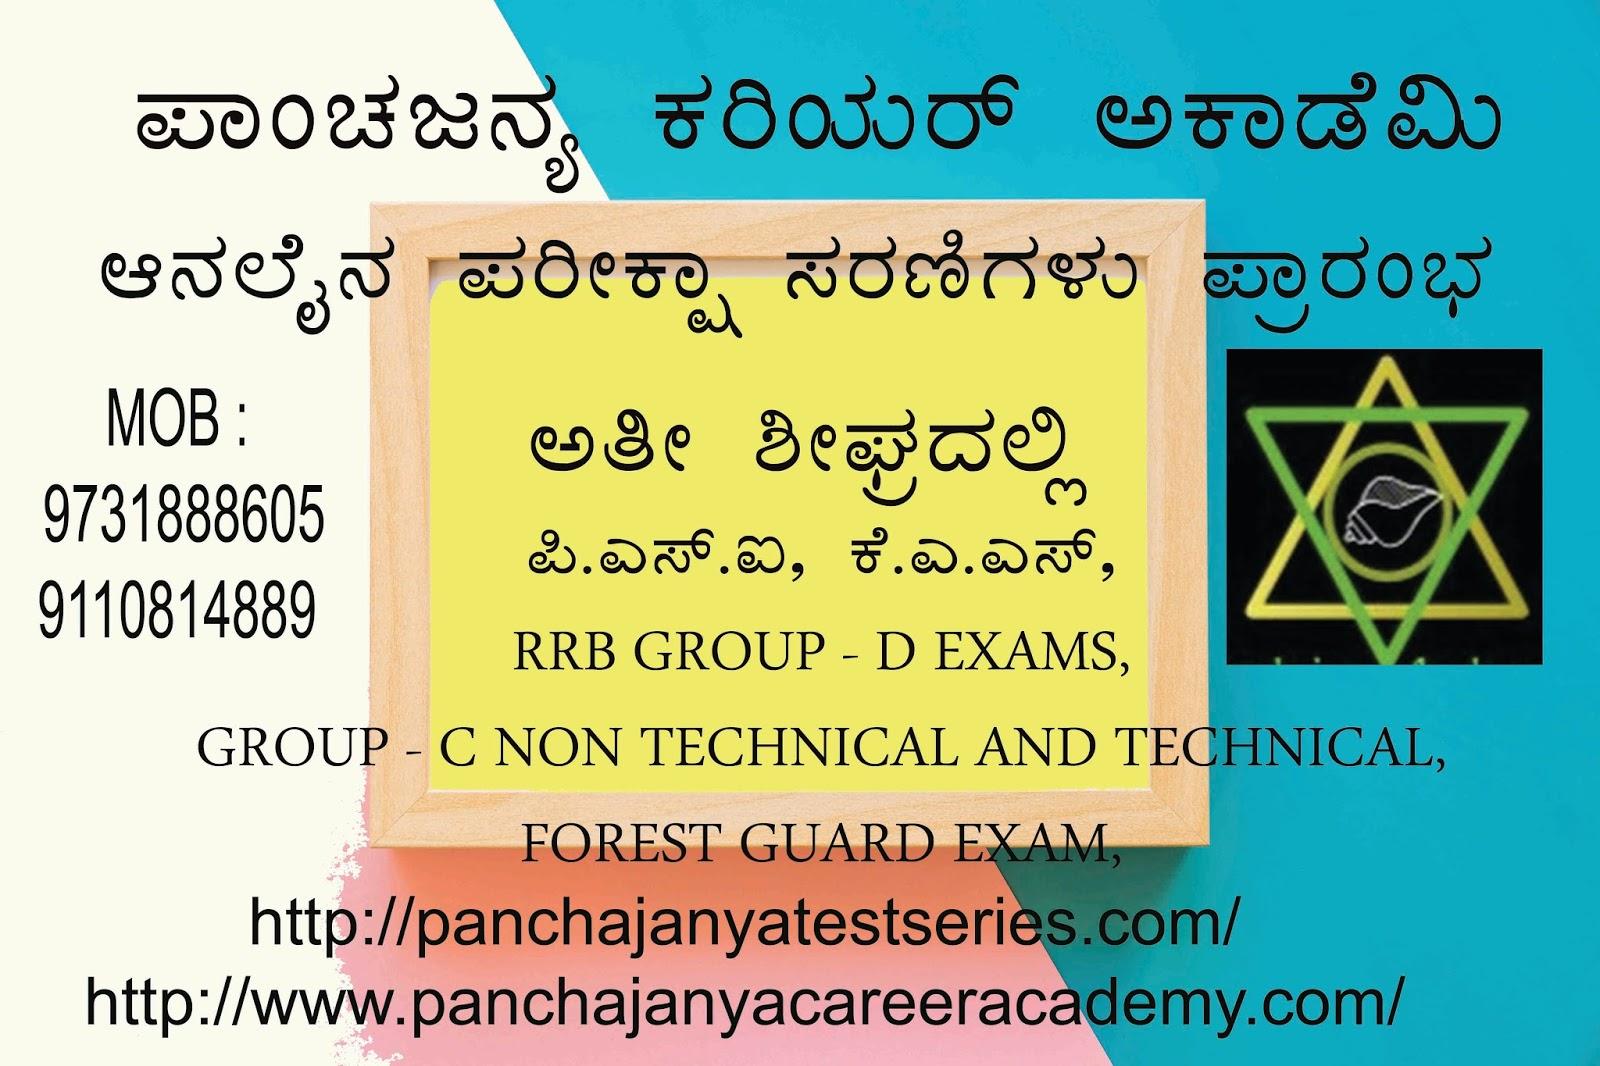 rrb group d online test